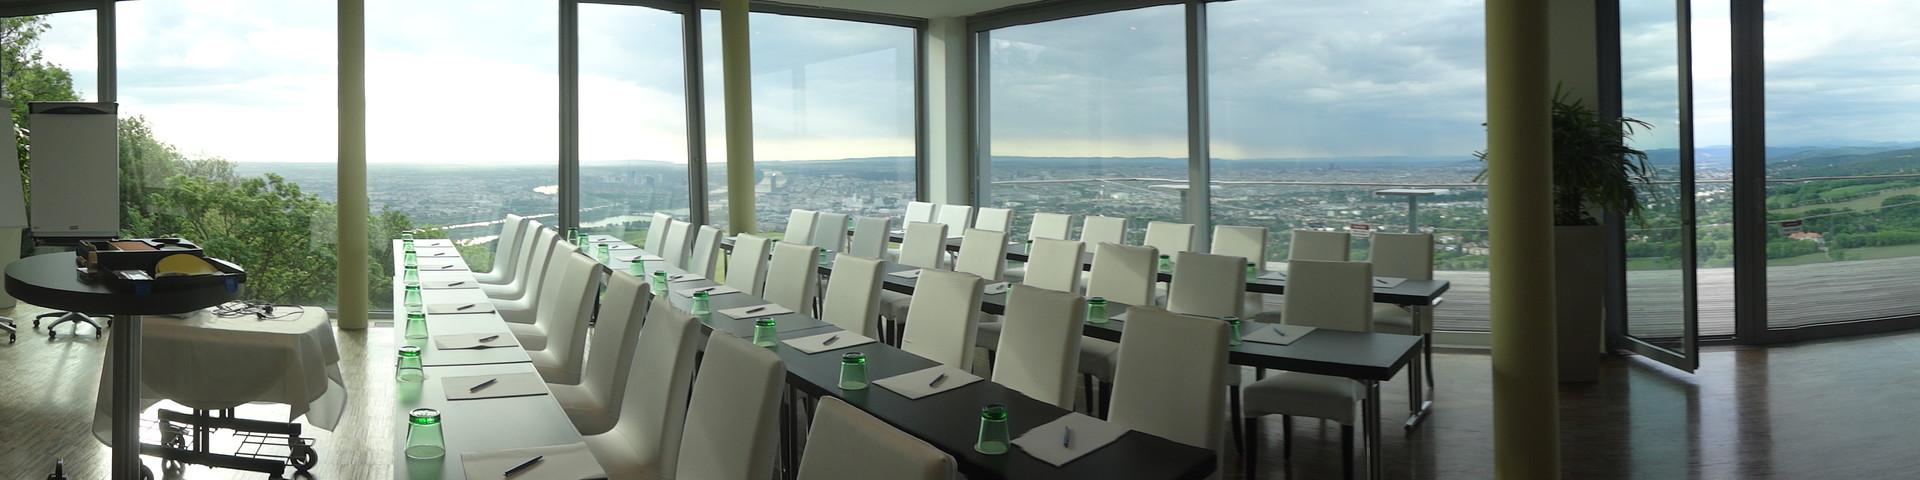 Suite Hotel Kahlenberg - Seminar Panorama & Terrasse © Kahlenberg